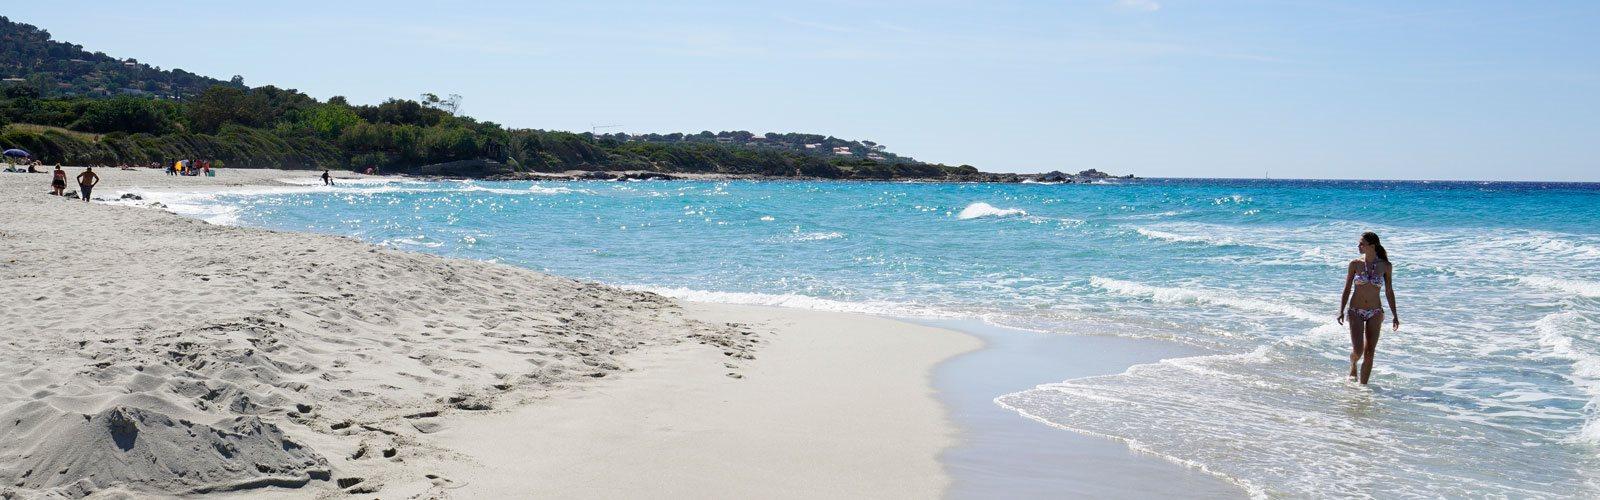 Korsika Strandurlaub Top Angebote Inkl Flug Hotel